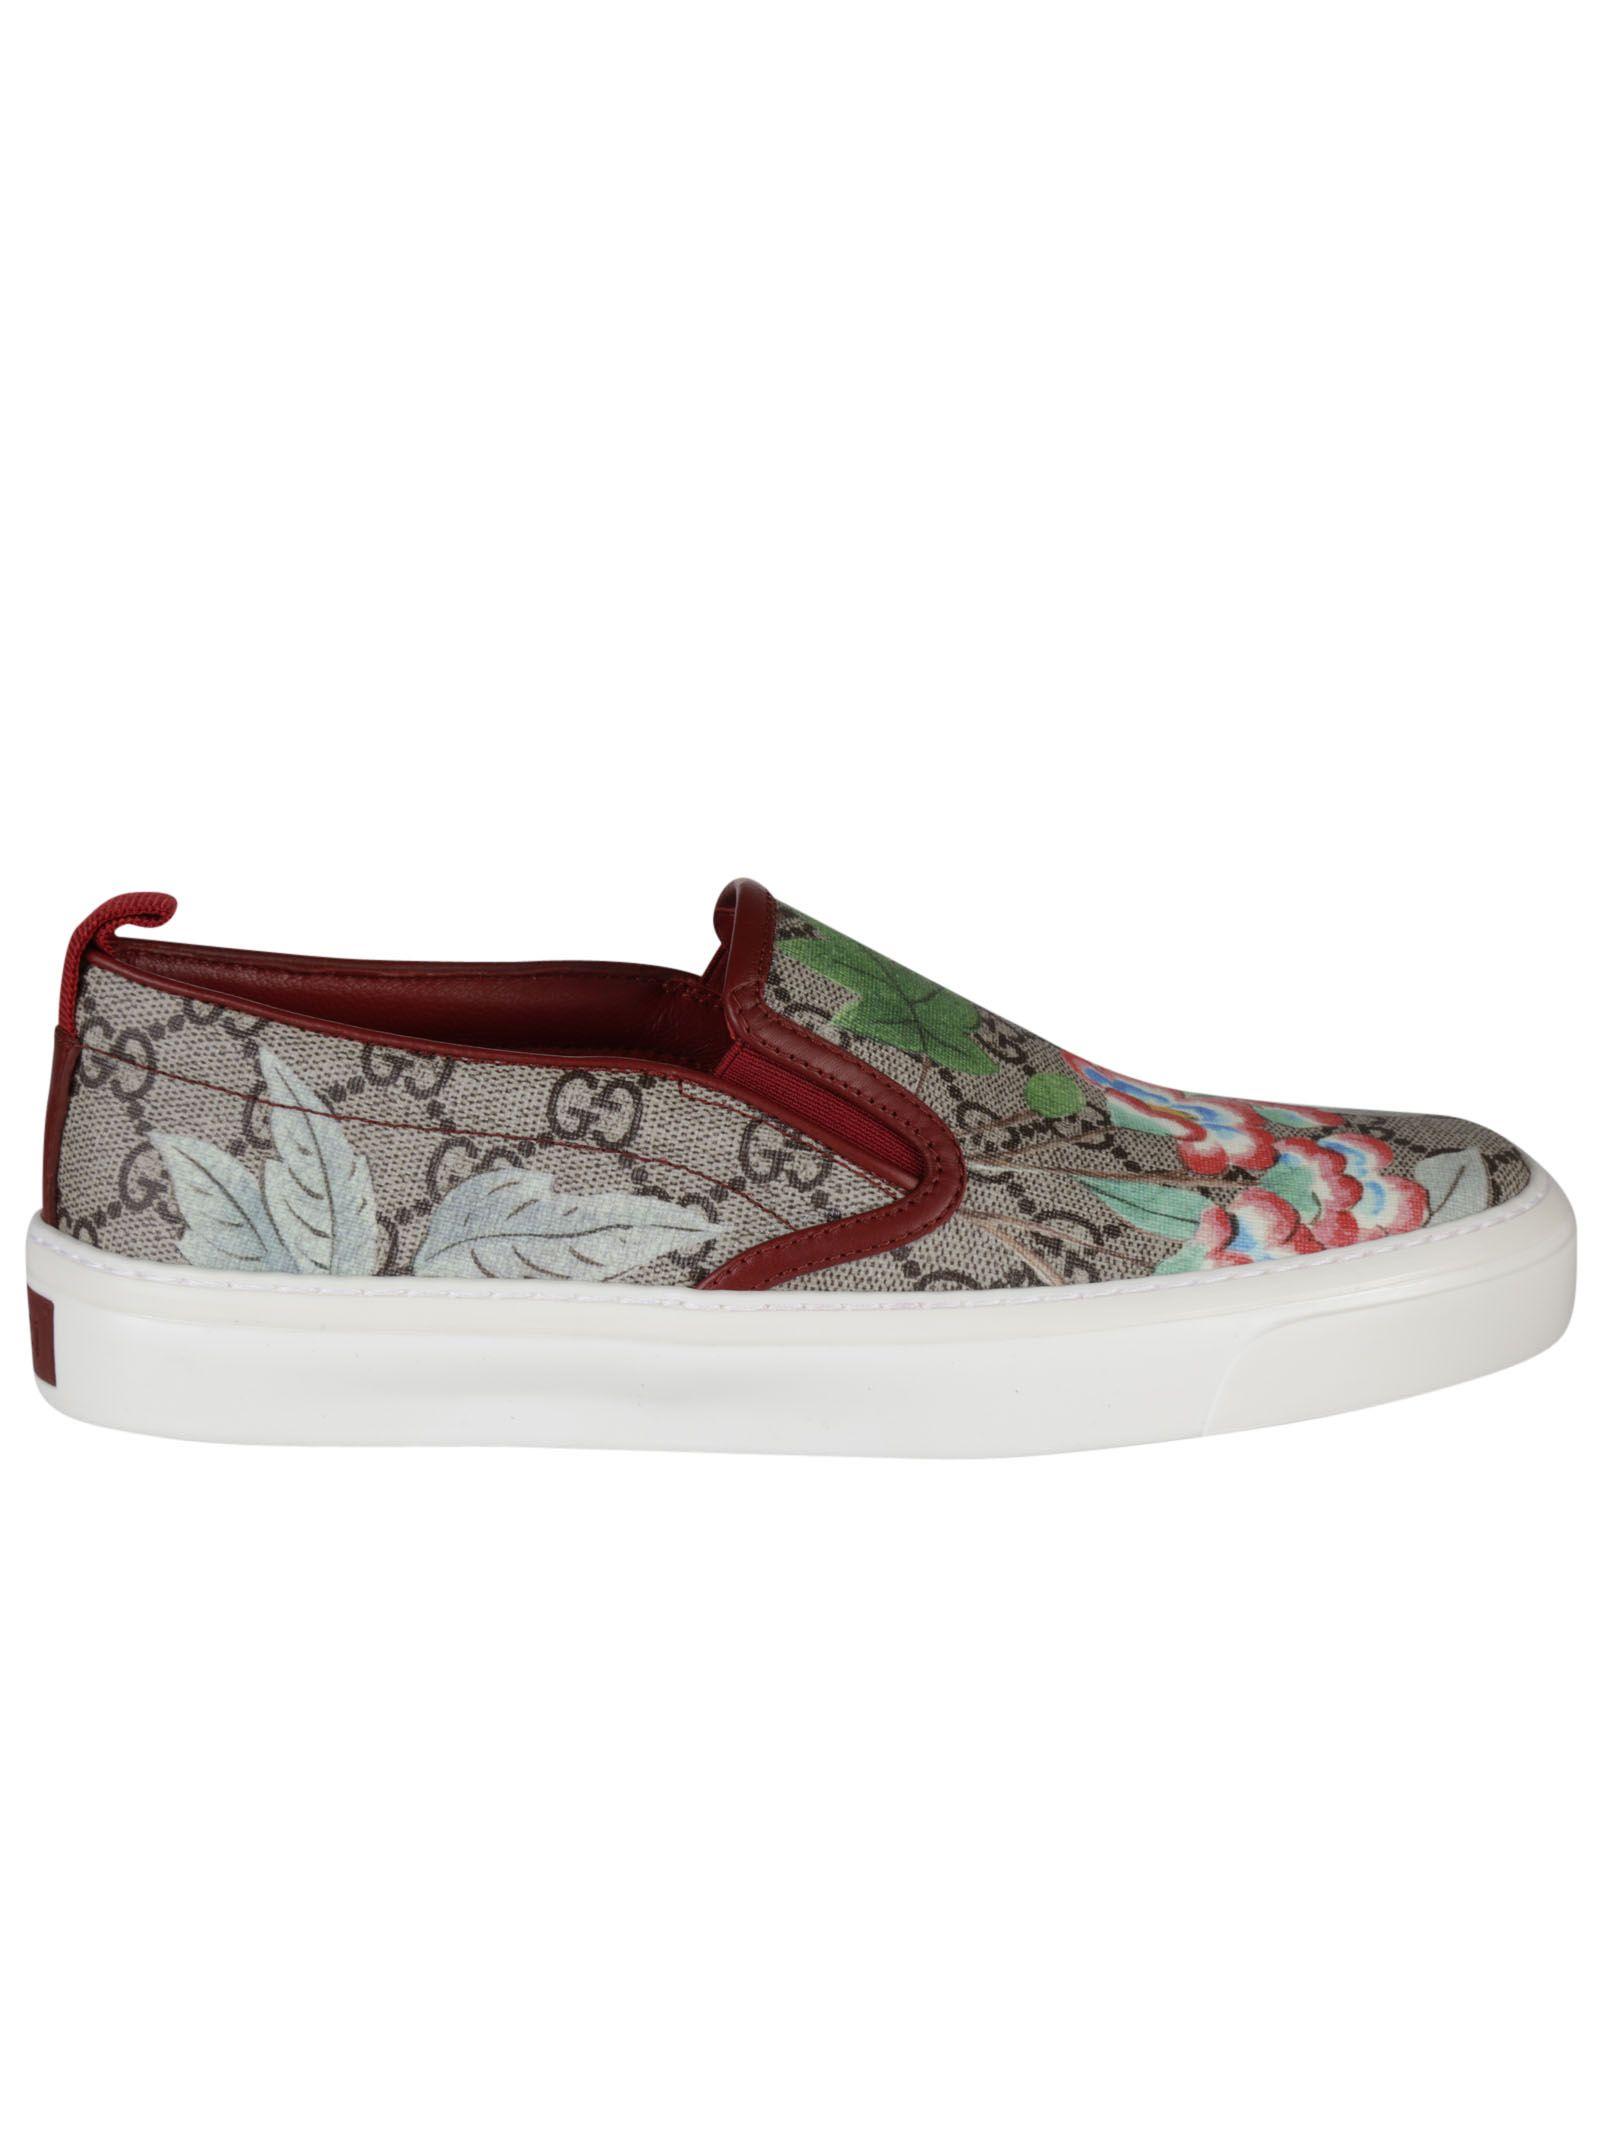 Gucci Tian Slip On Sneakers